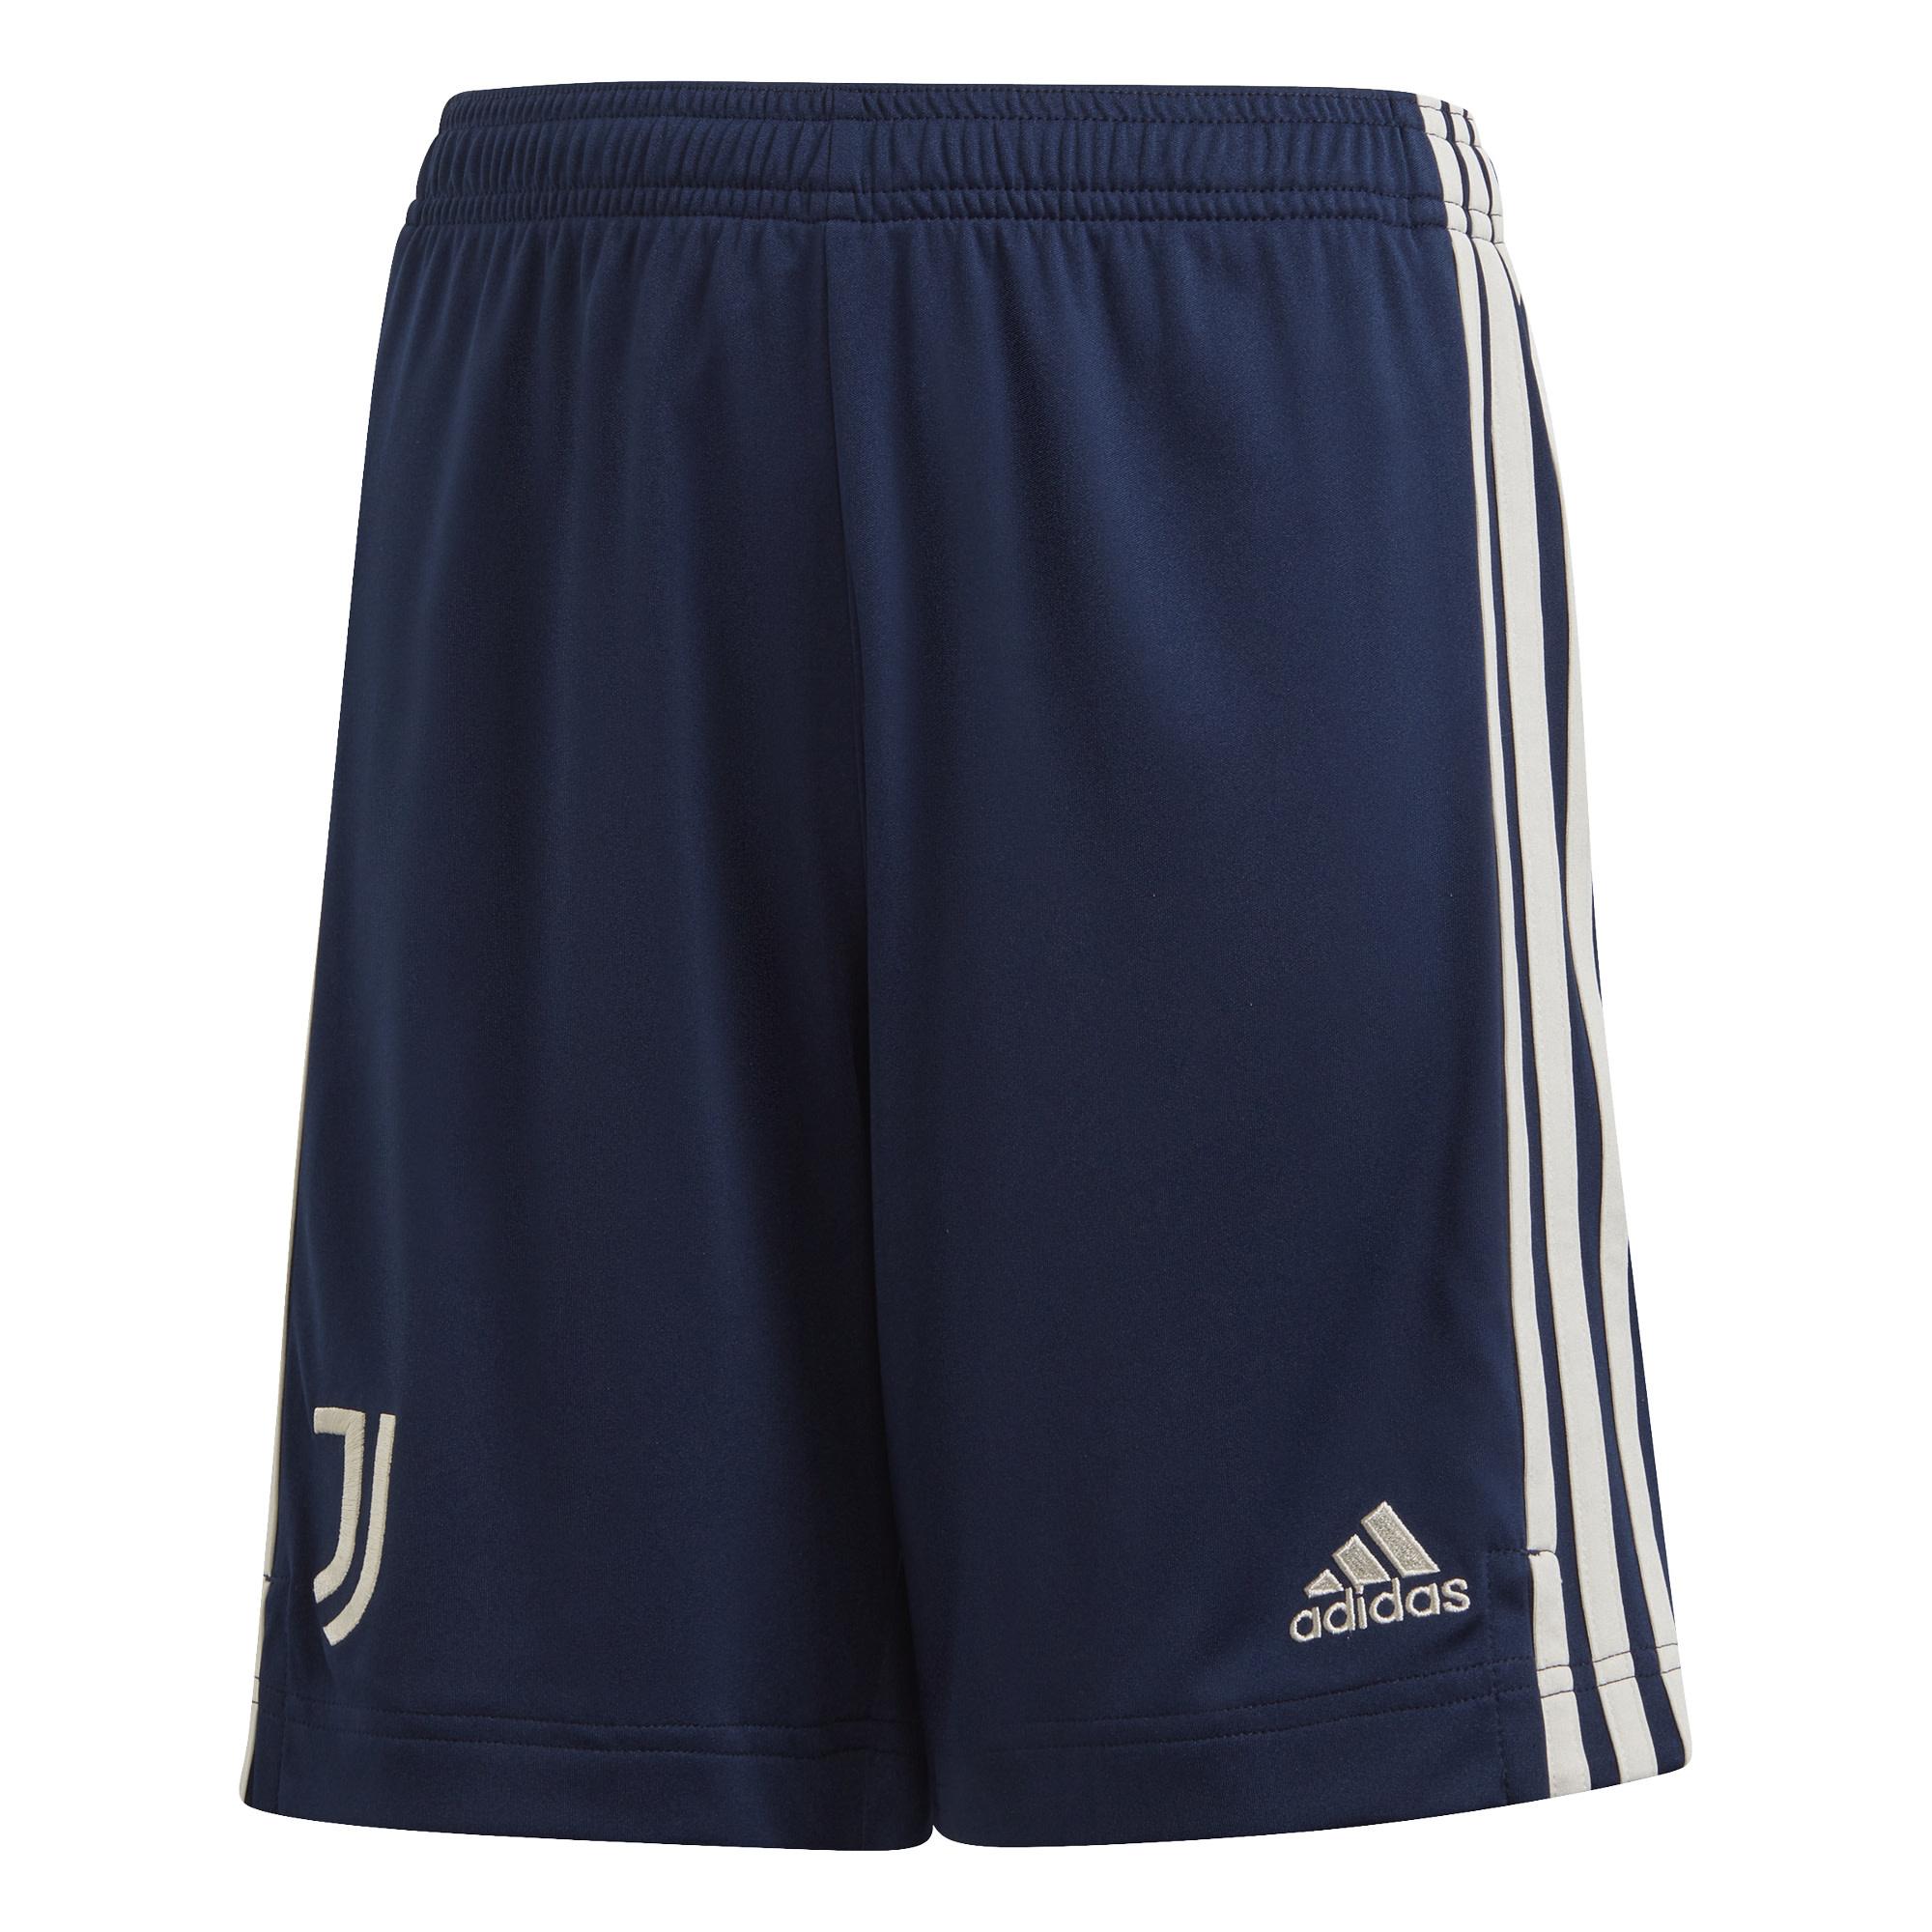 Adidas ADIDAS JR Juventus Away Short '20-'21